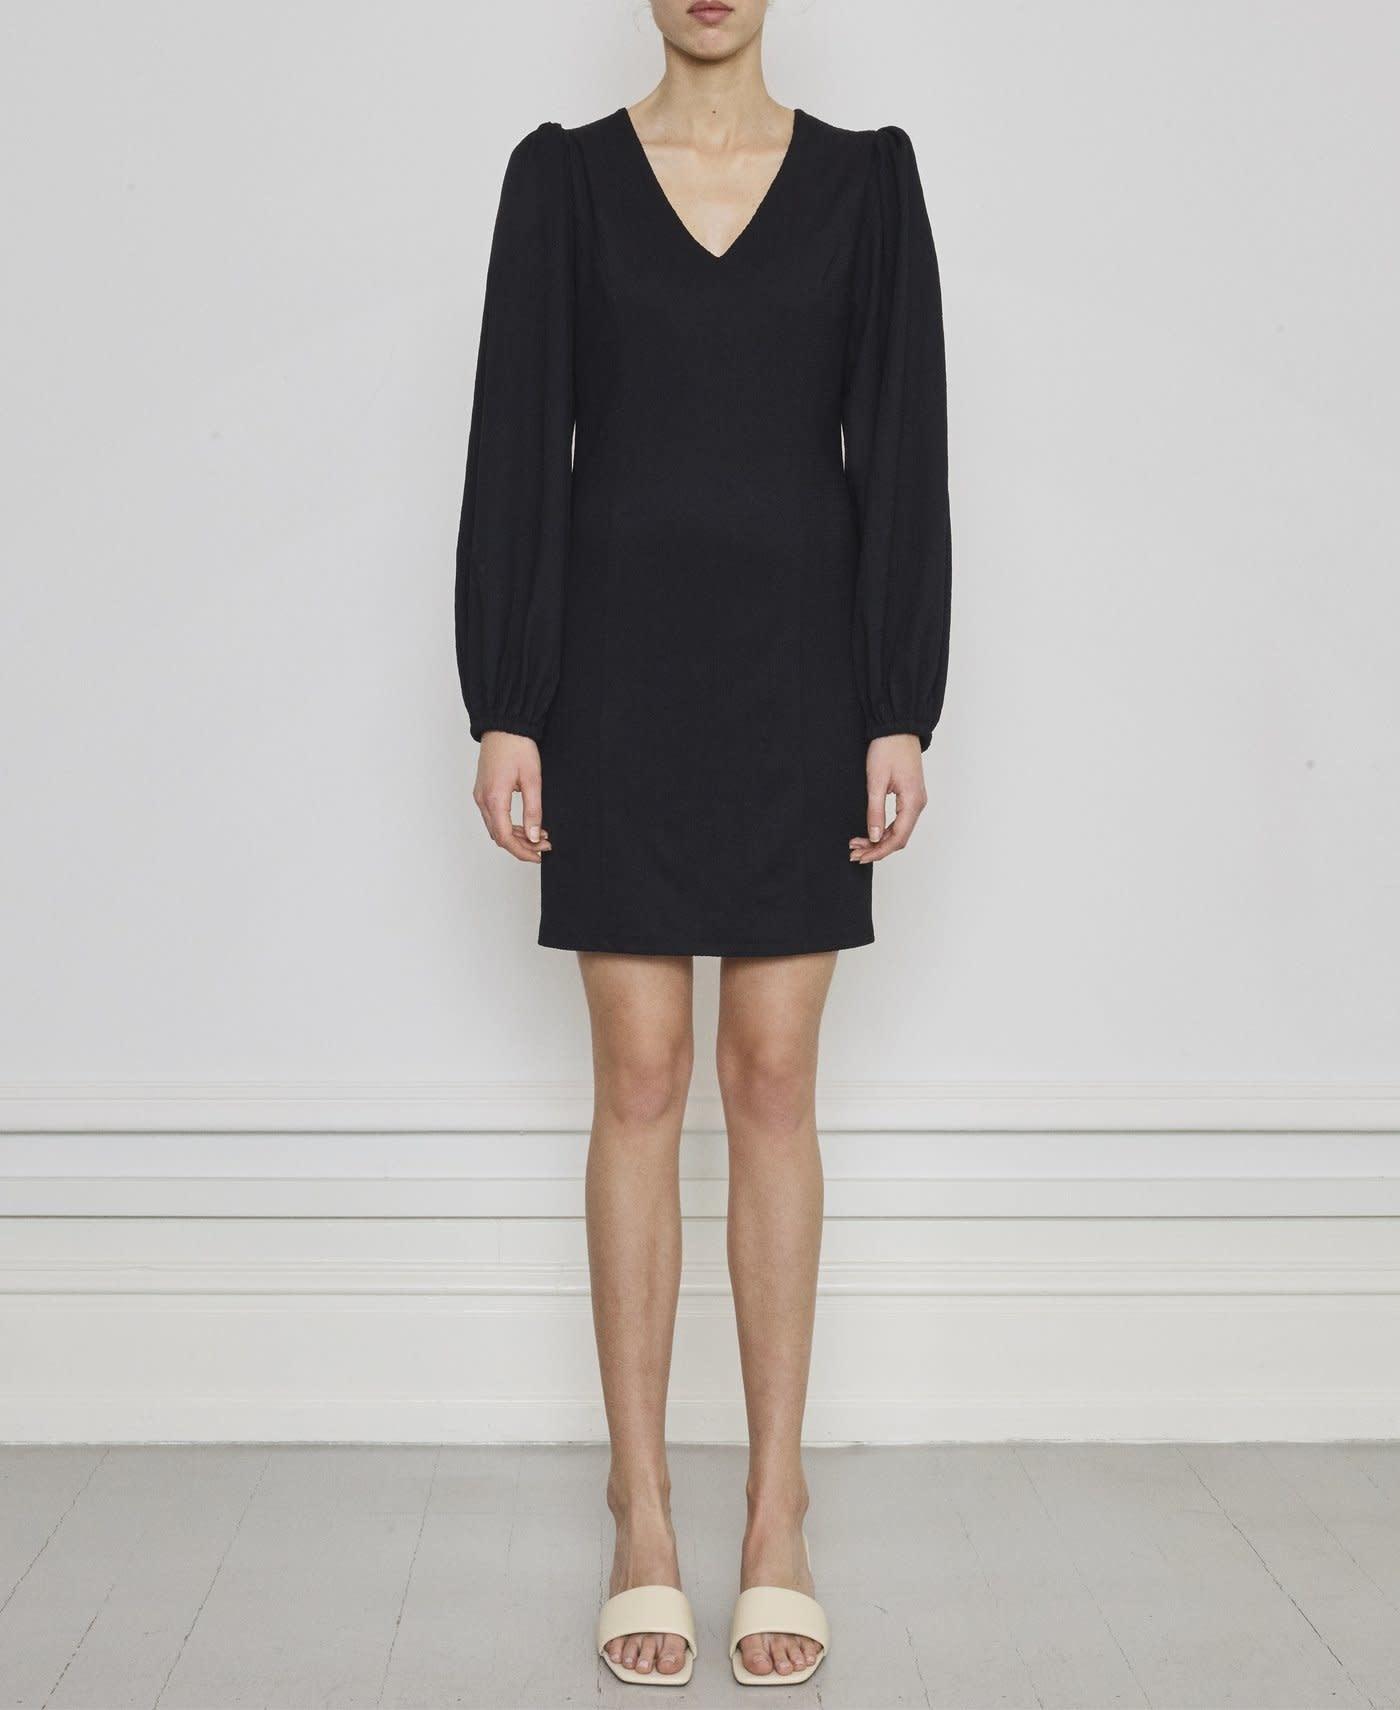 venus dress black-5